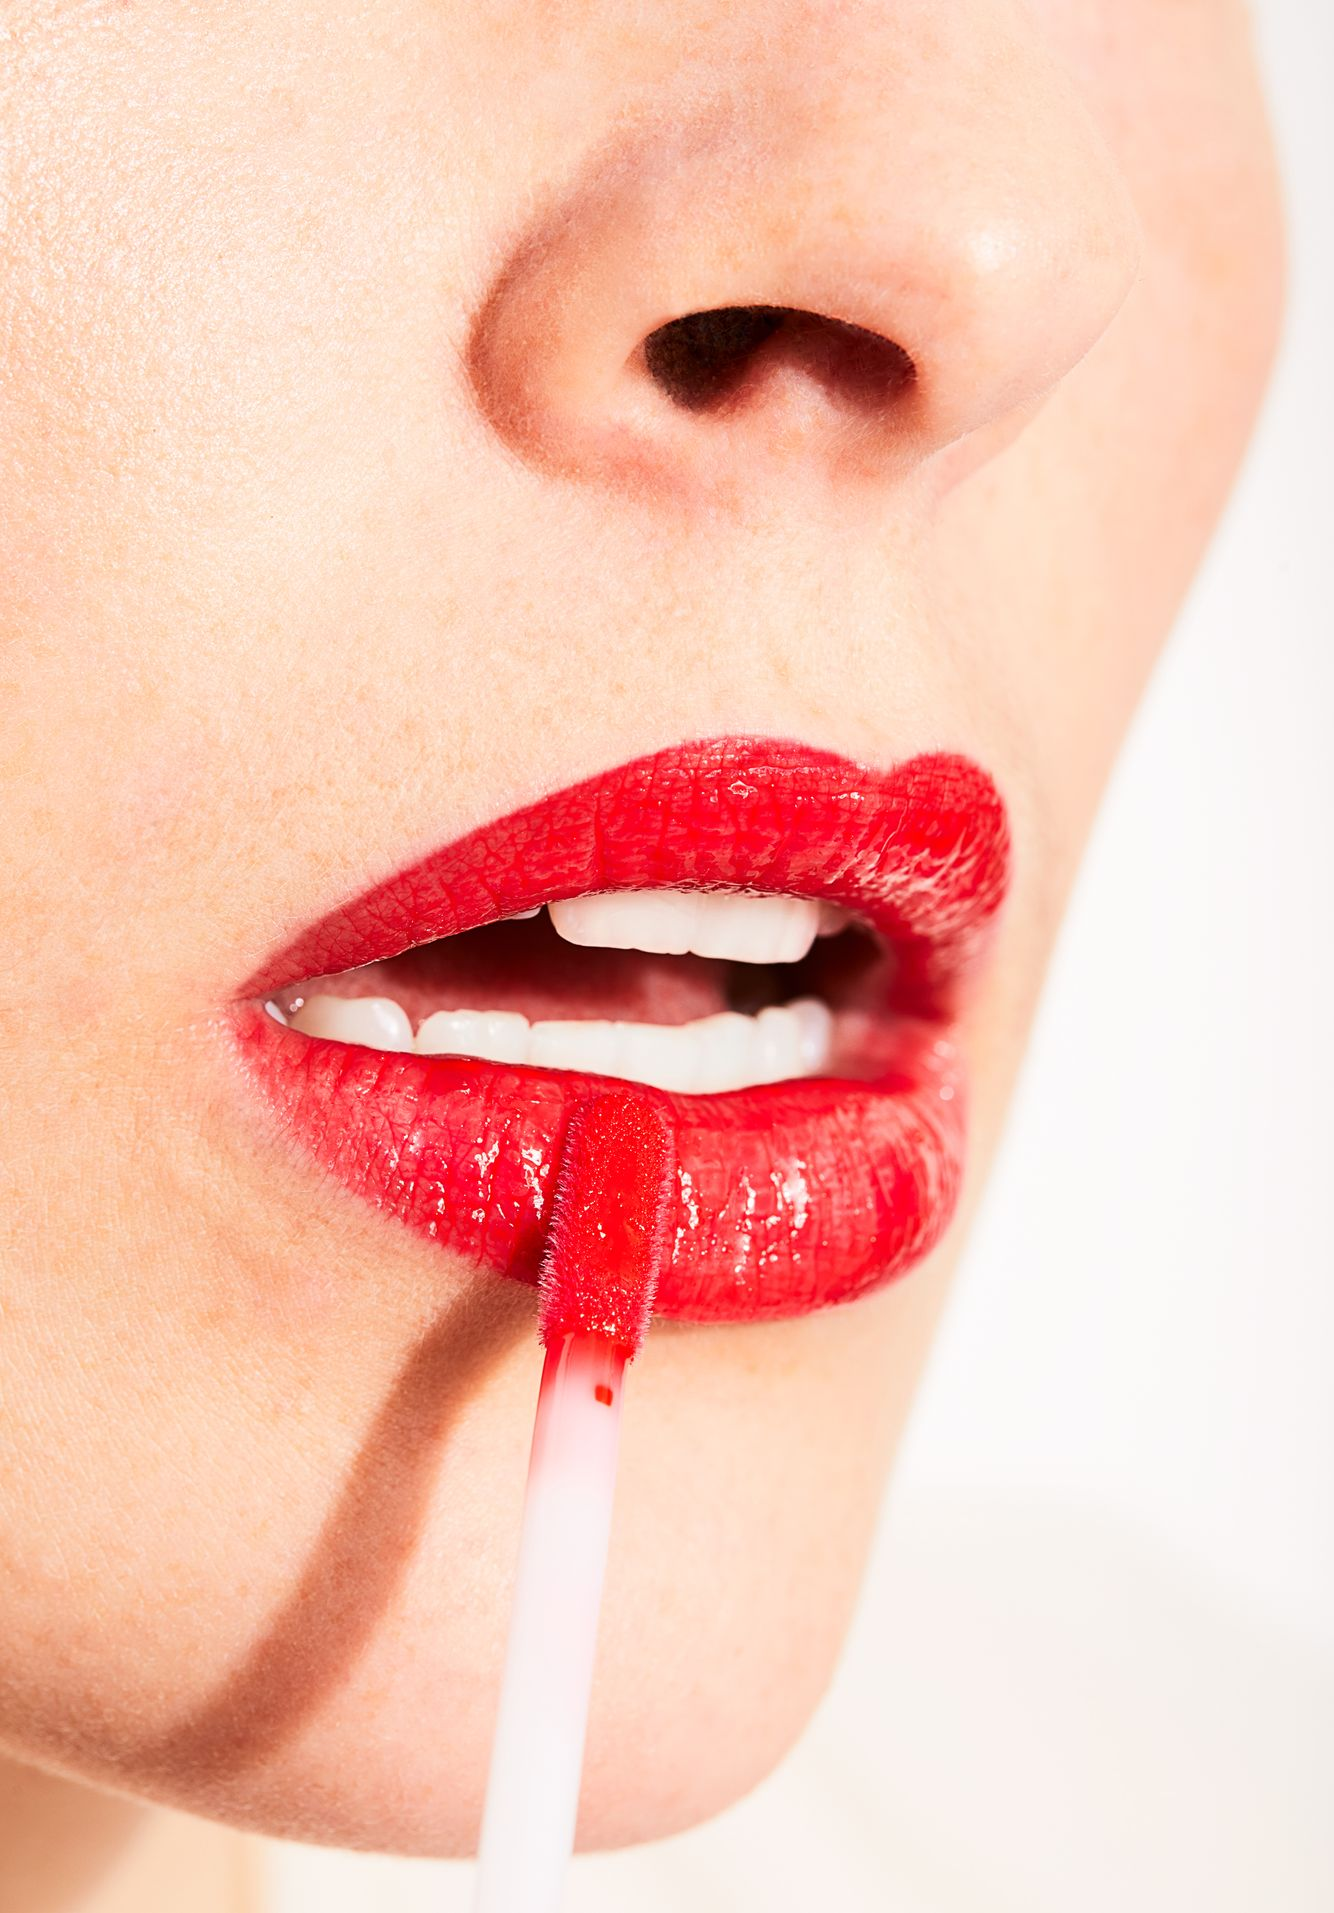 W3ll_2020_LipGloss_CandyApple_23488.jpg